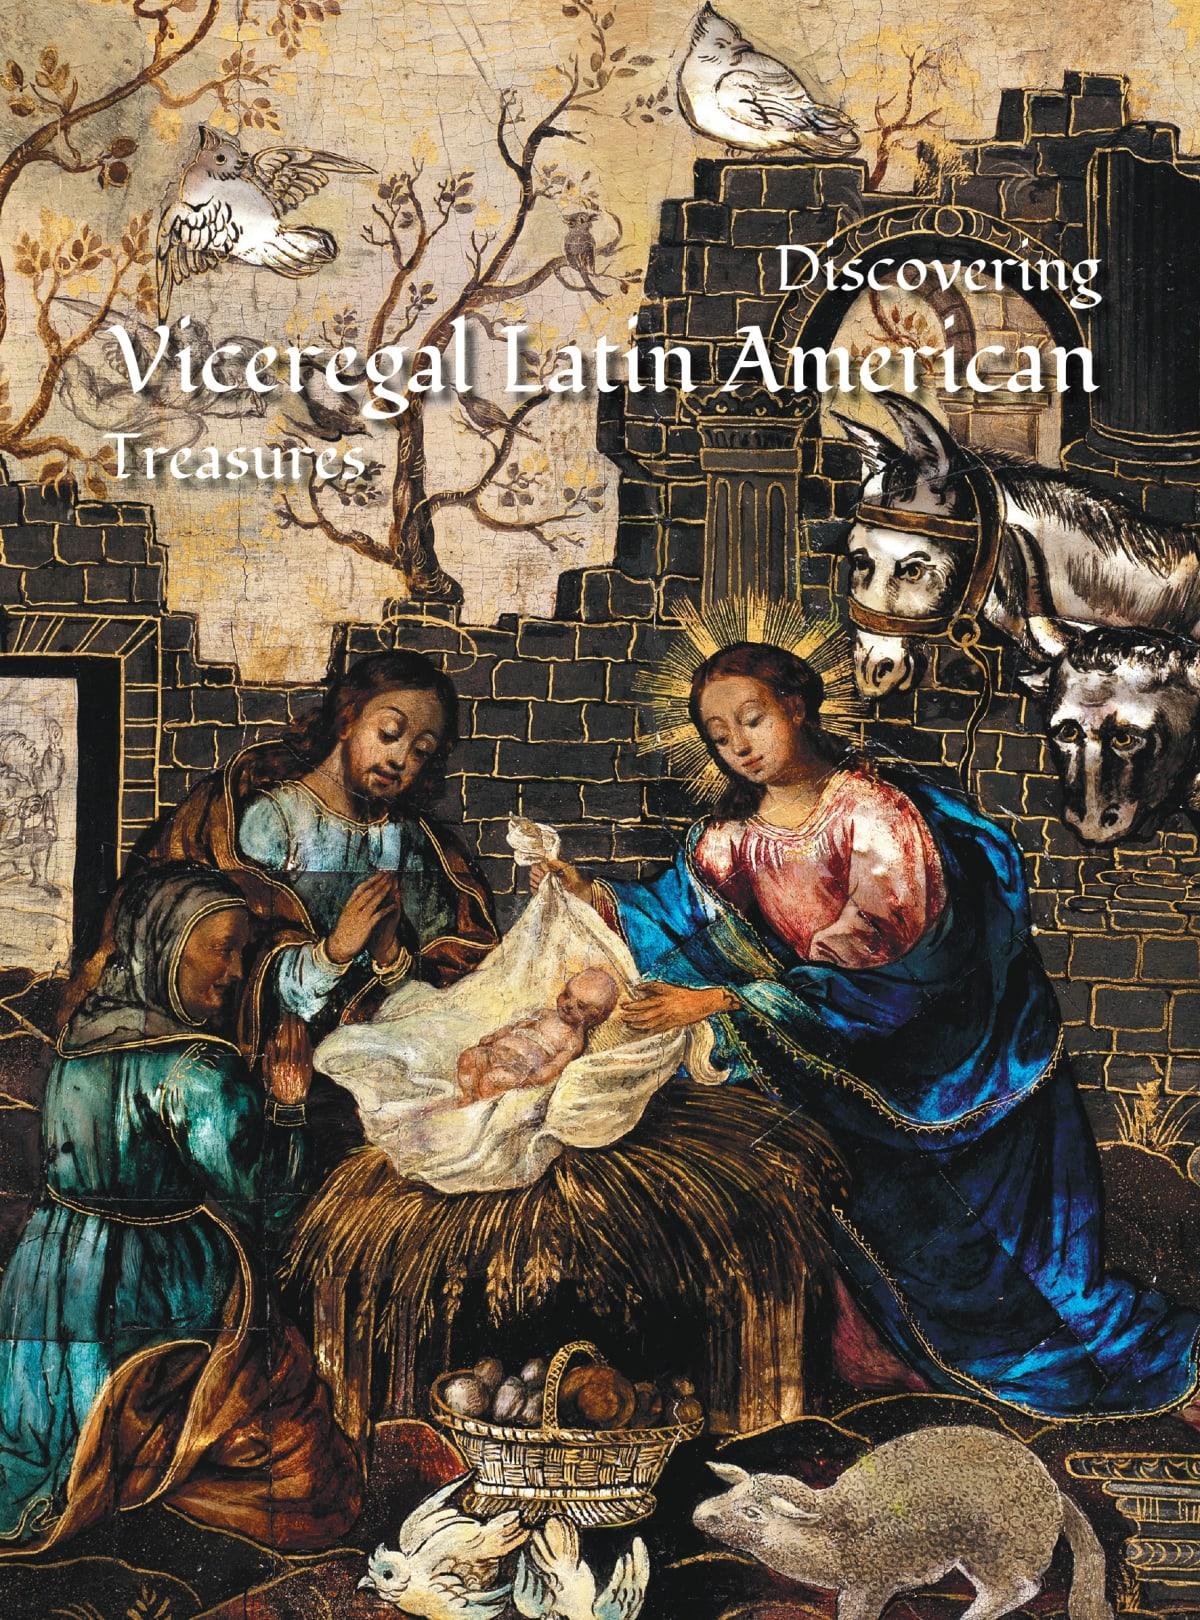 Discovering Viceregal Latin American Treasures